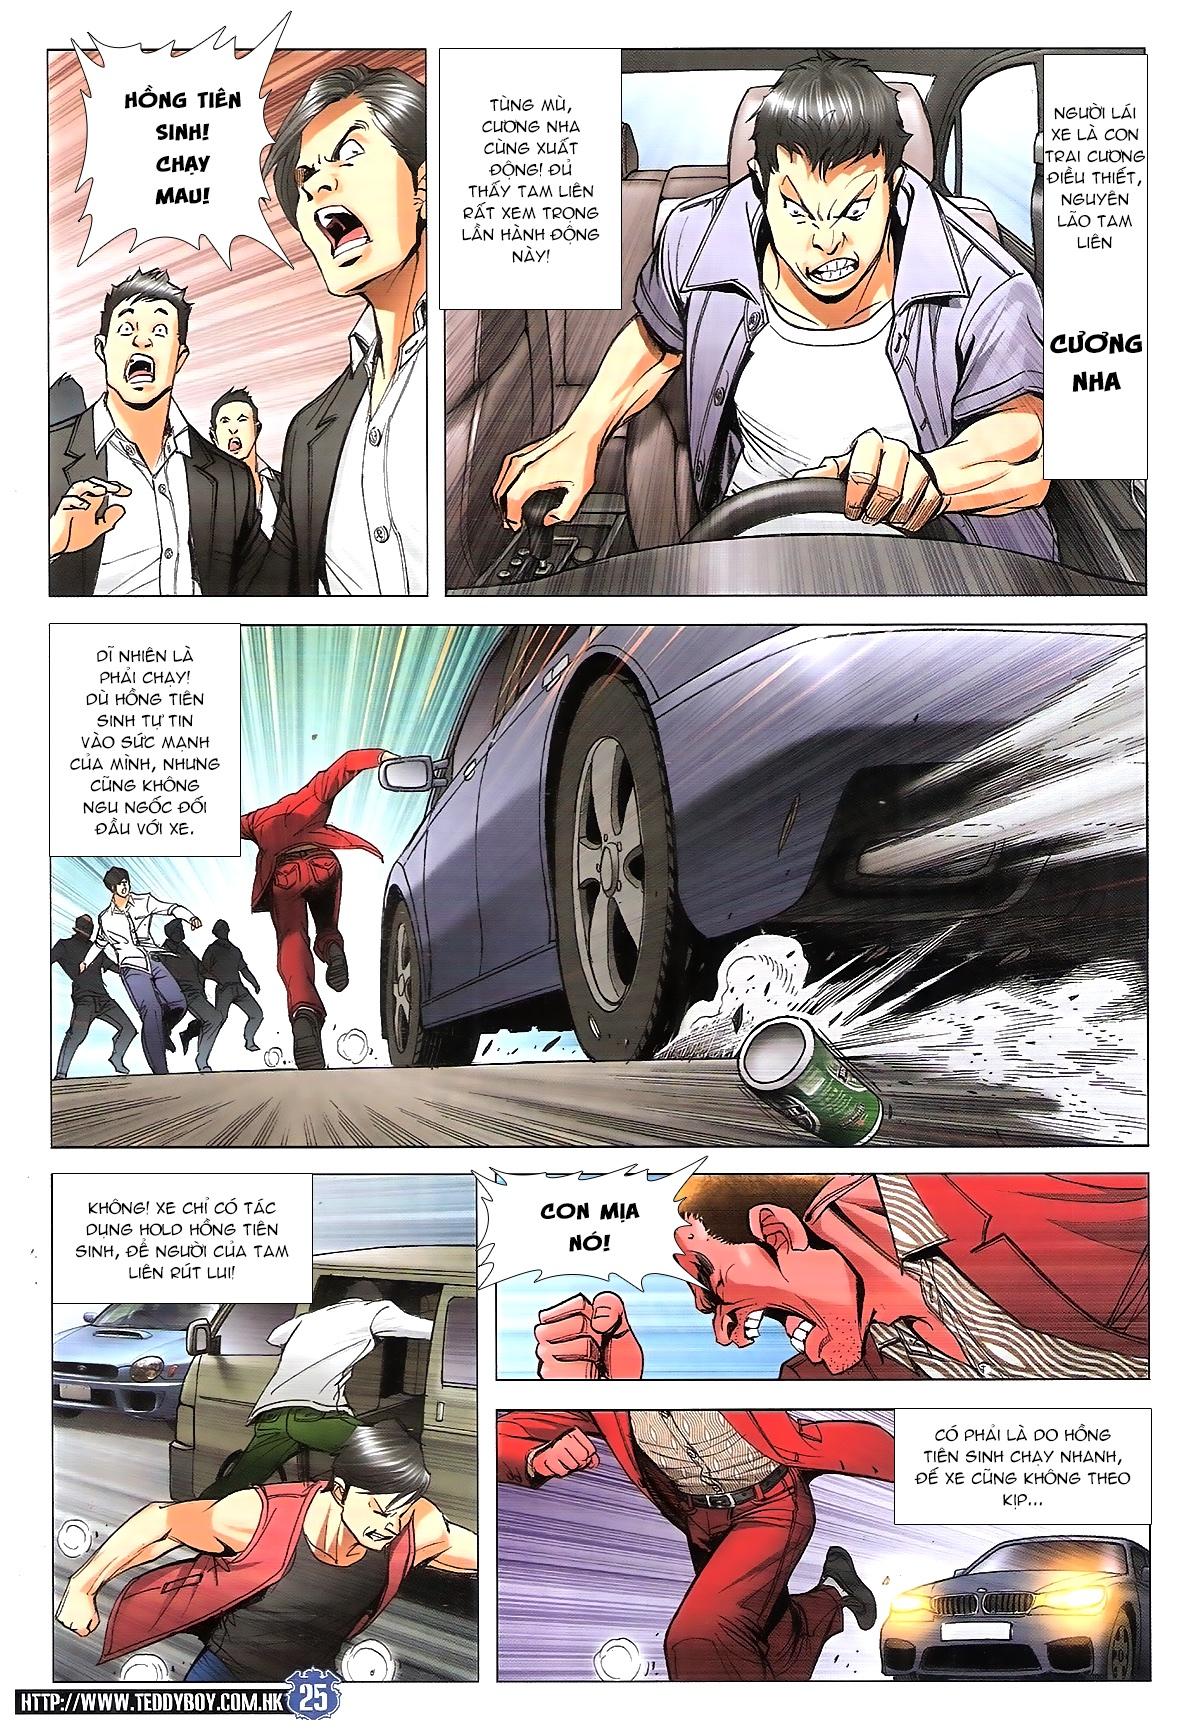 Người Trong Giang Hồ chapter 1807: hồng tiên sinh trang 24